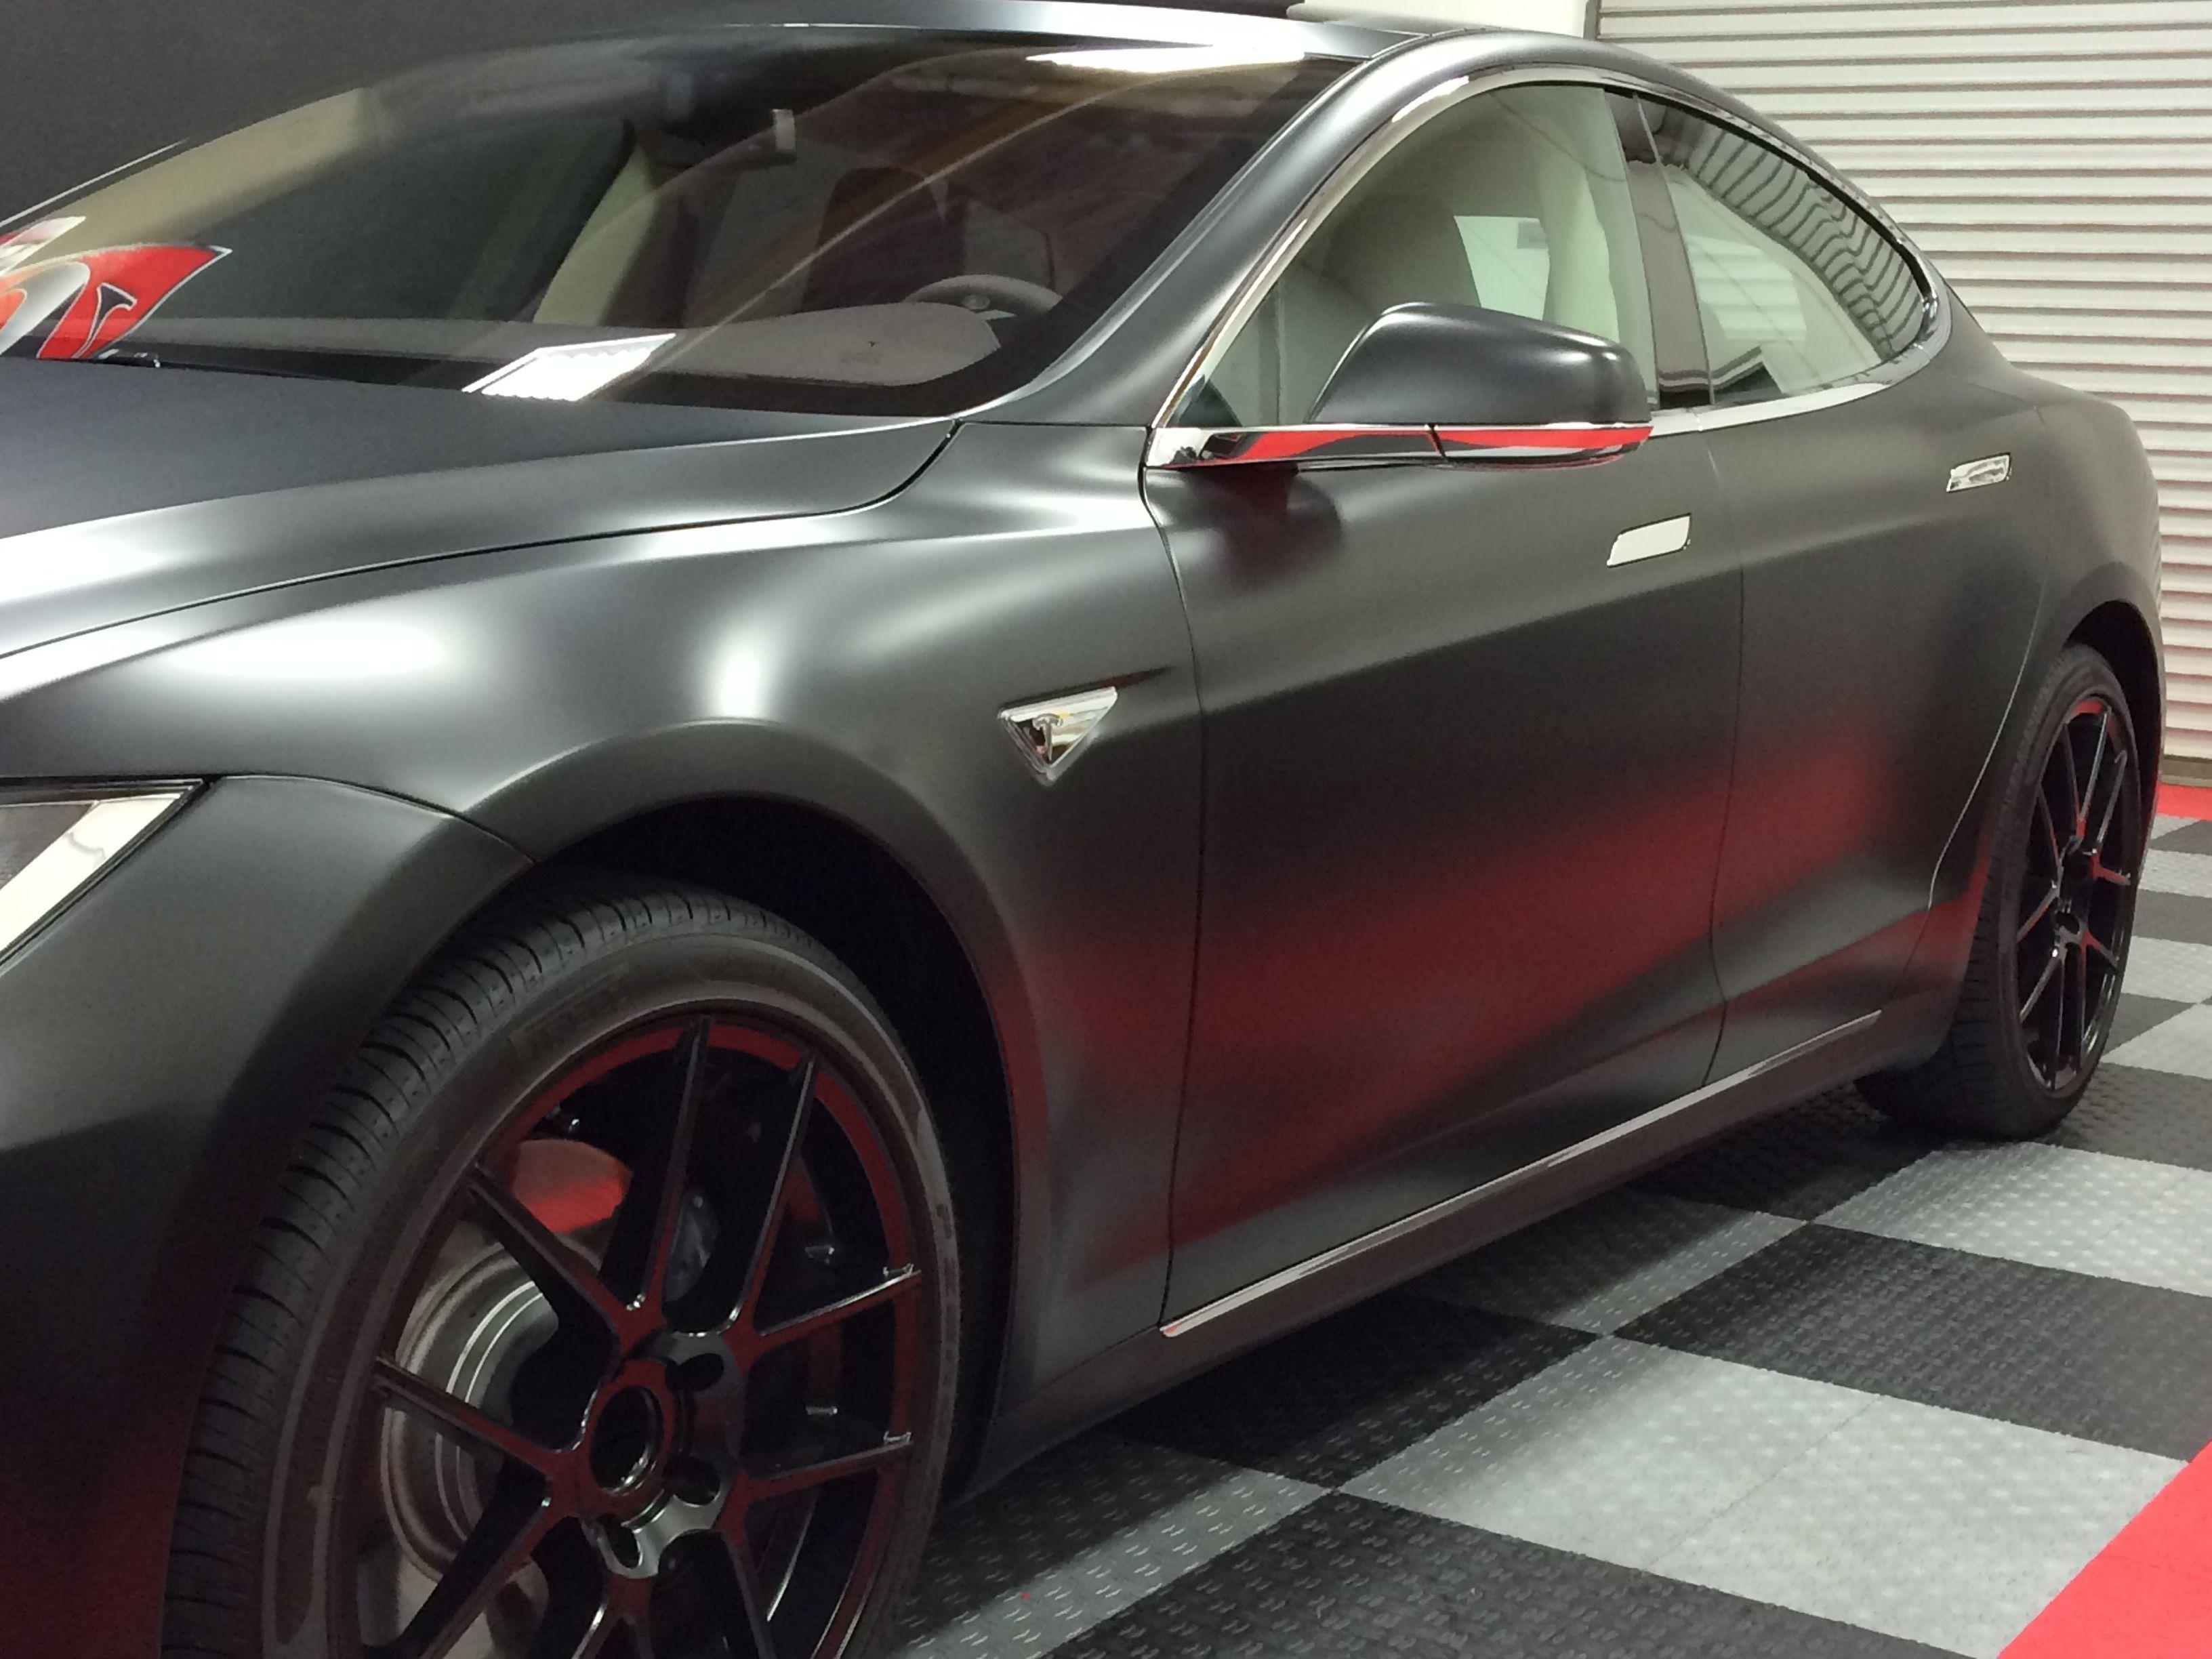 Tesla Model S Full Car Matte Finish Paint Protection Wrap